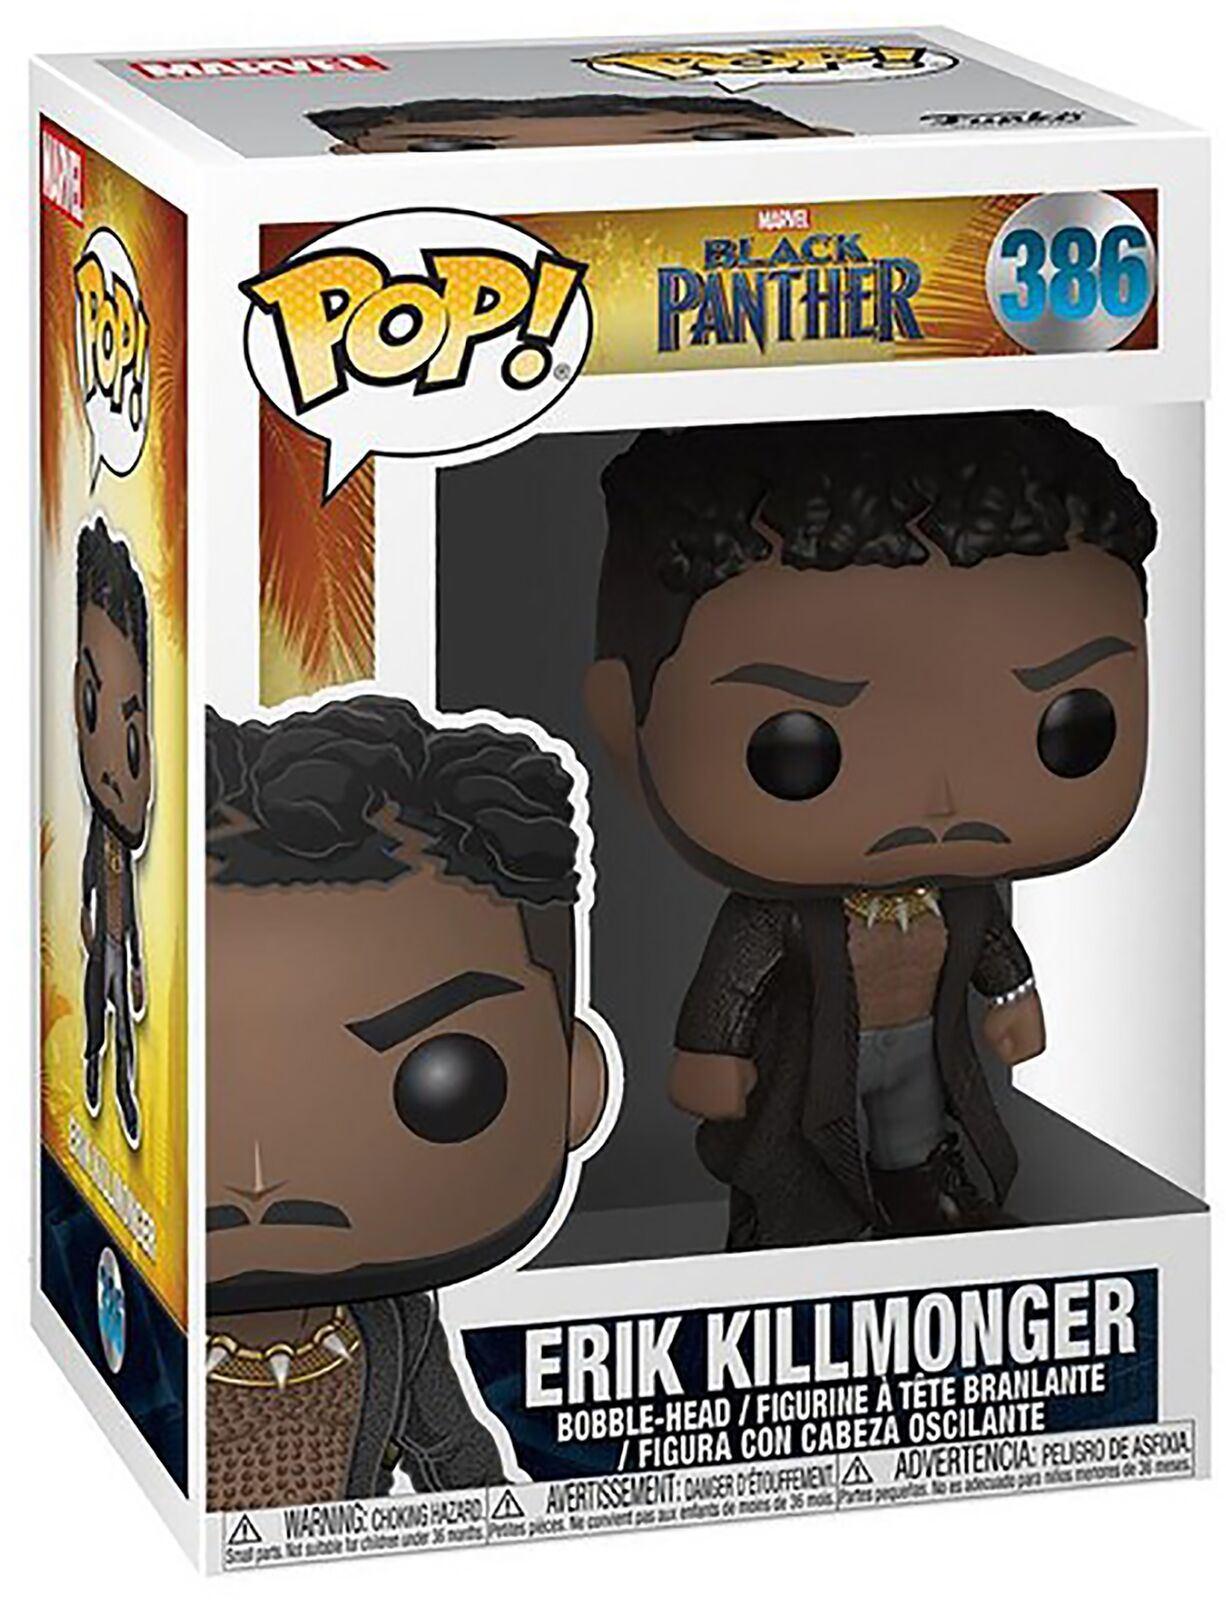 MARVEL Black Panther-Erik Killmonger con cicatrices FUNKO POP Vinilo Figura #386!